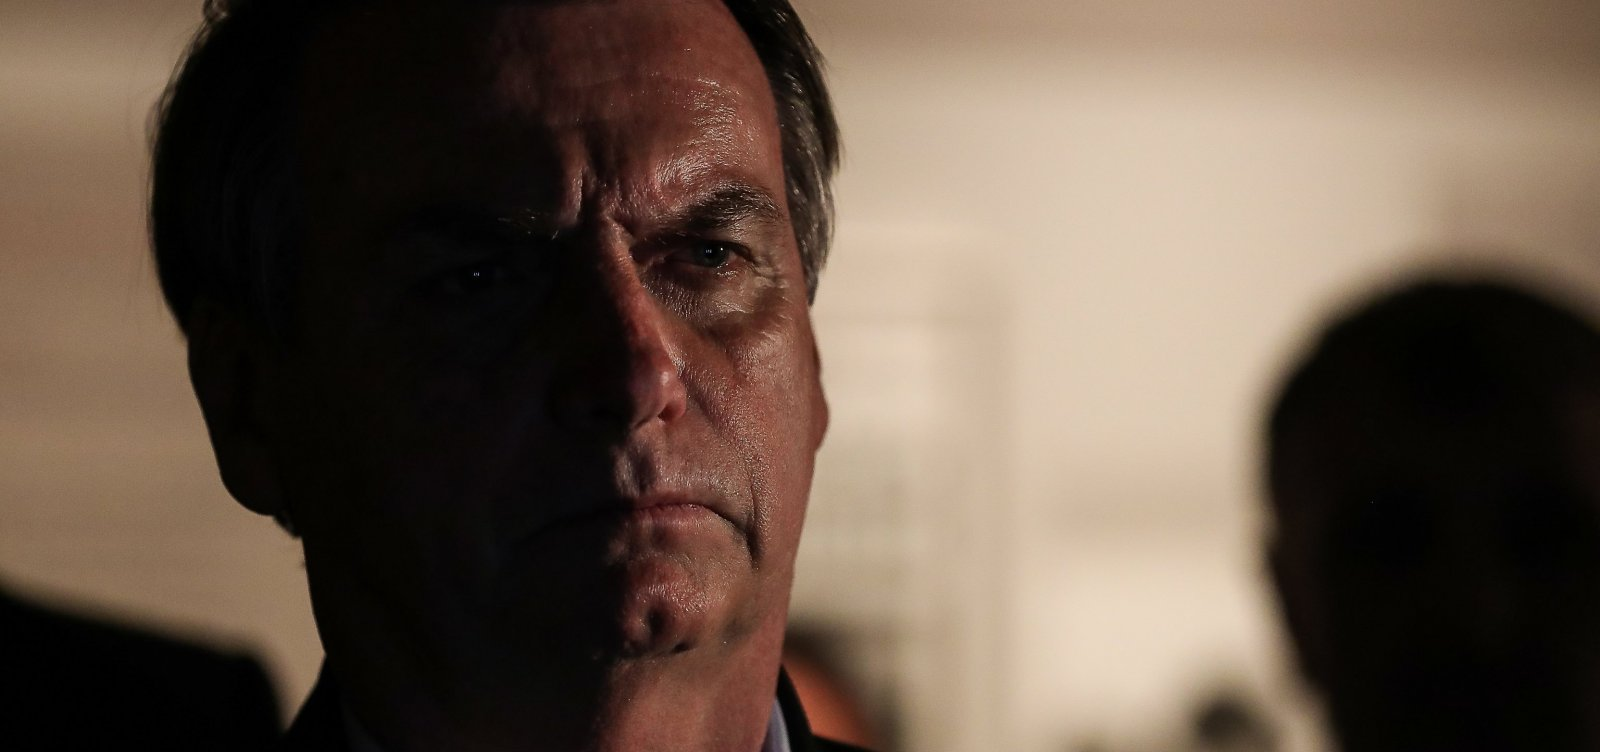 [Após compartilhar vídeo, Bolsonaro diz que há tentativa de 'tumultuar' República]